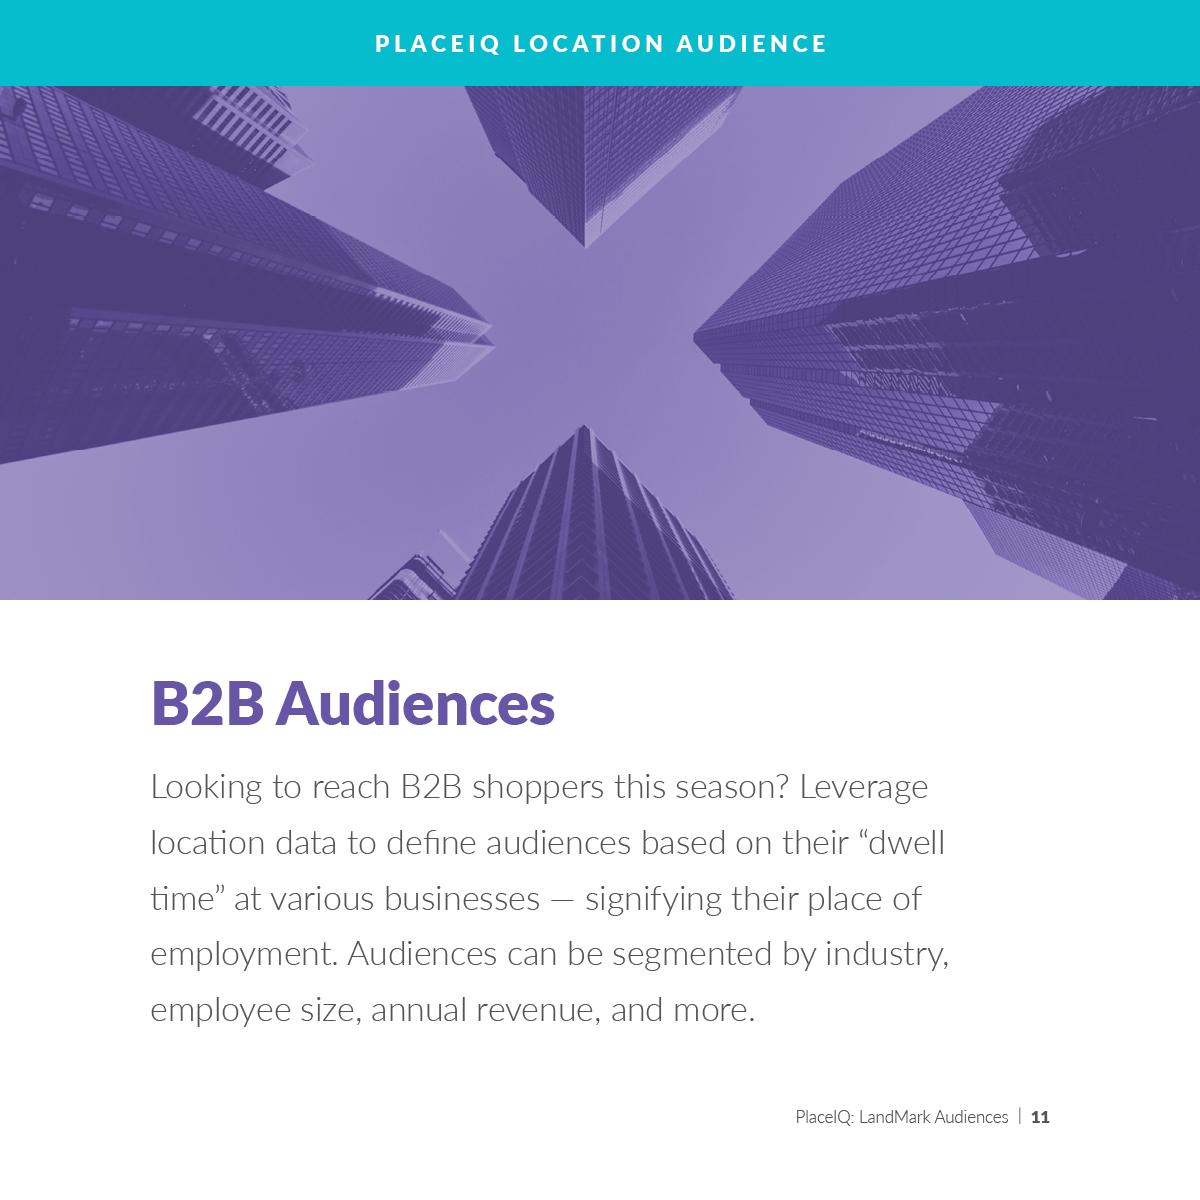 B2B Audiences